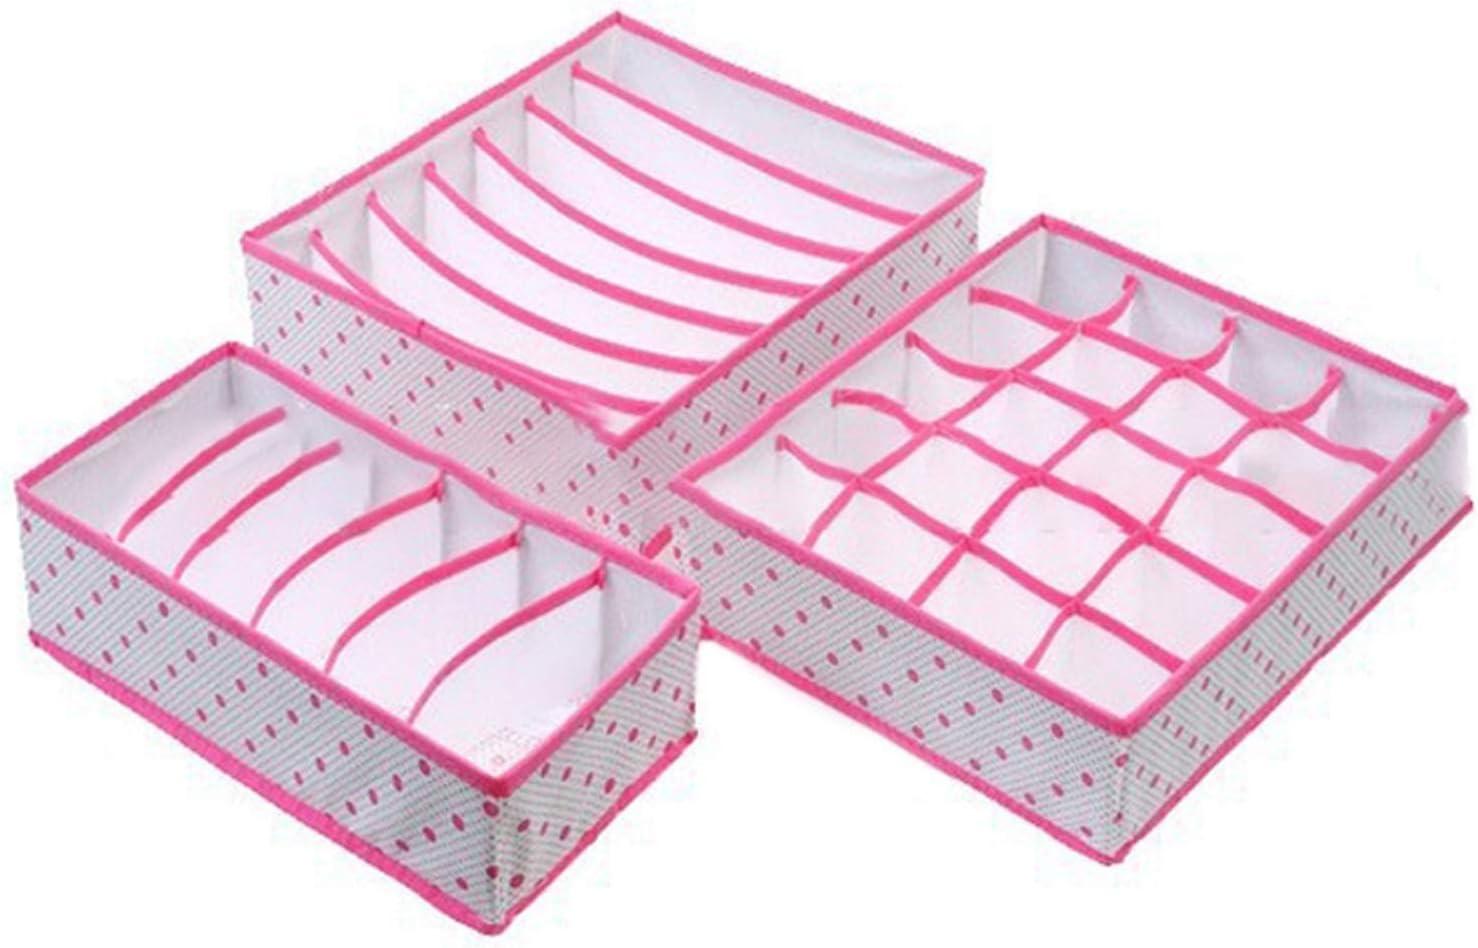 Charlotte Mall Box 3PCS Set Foldable Underwear Tie Socks Bra National products Clothes Organizer